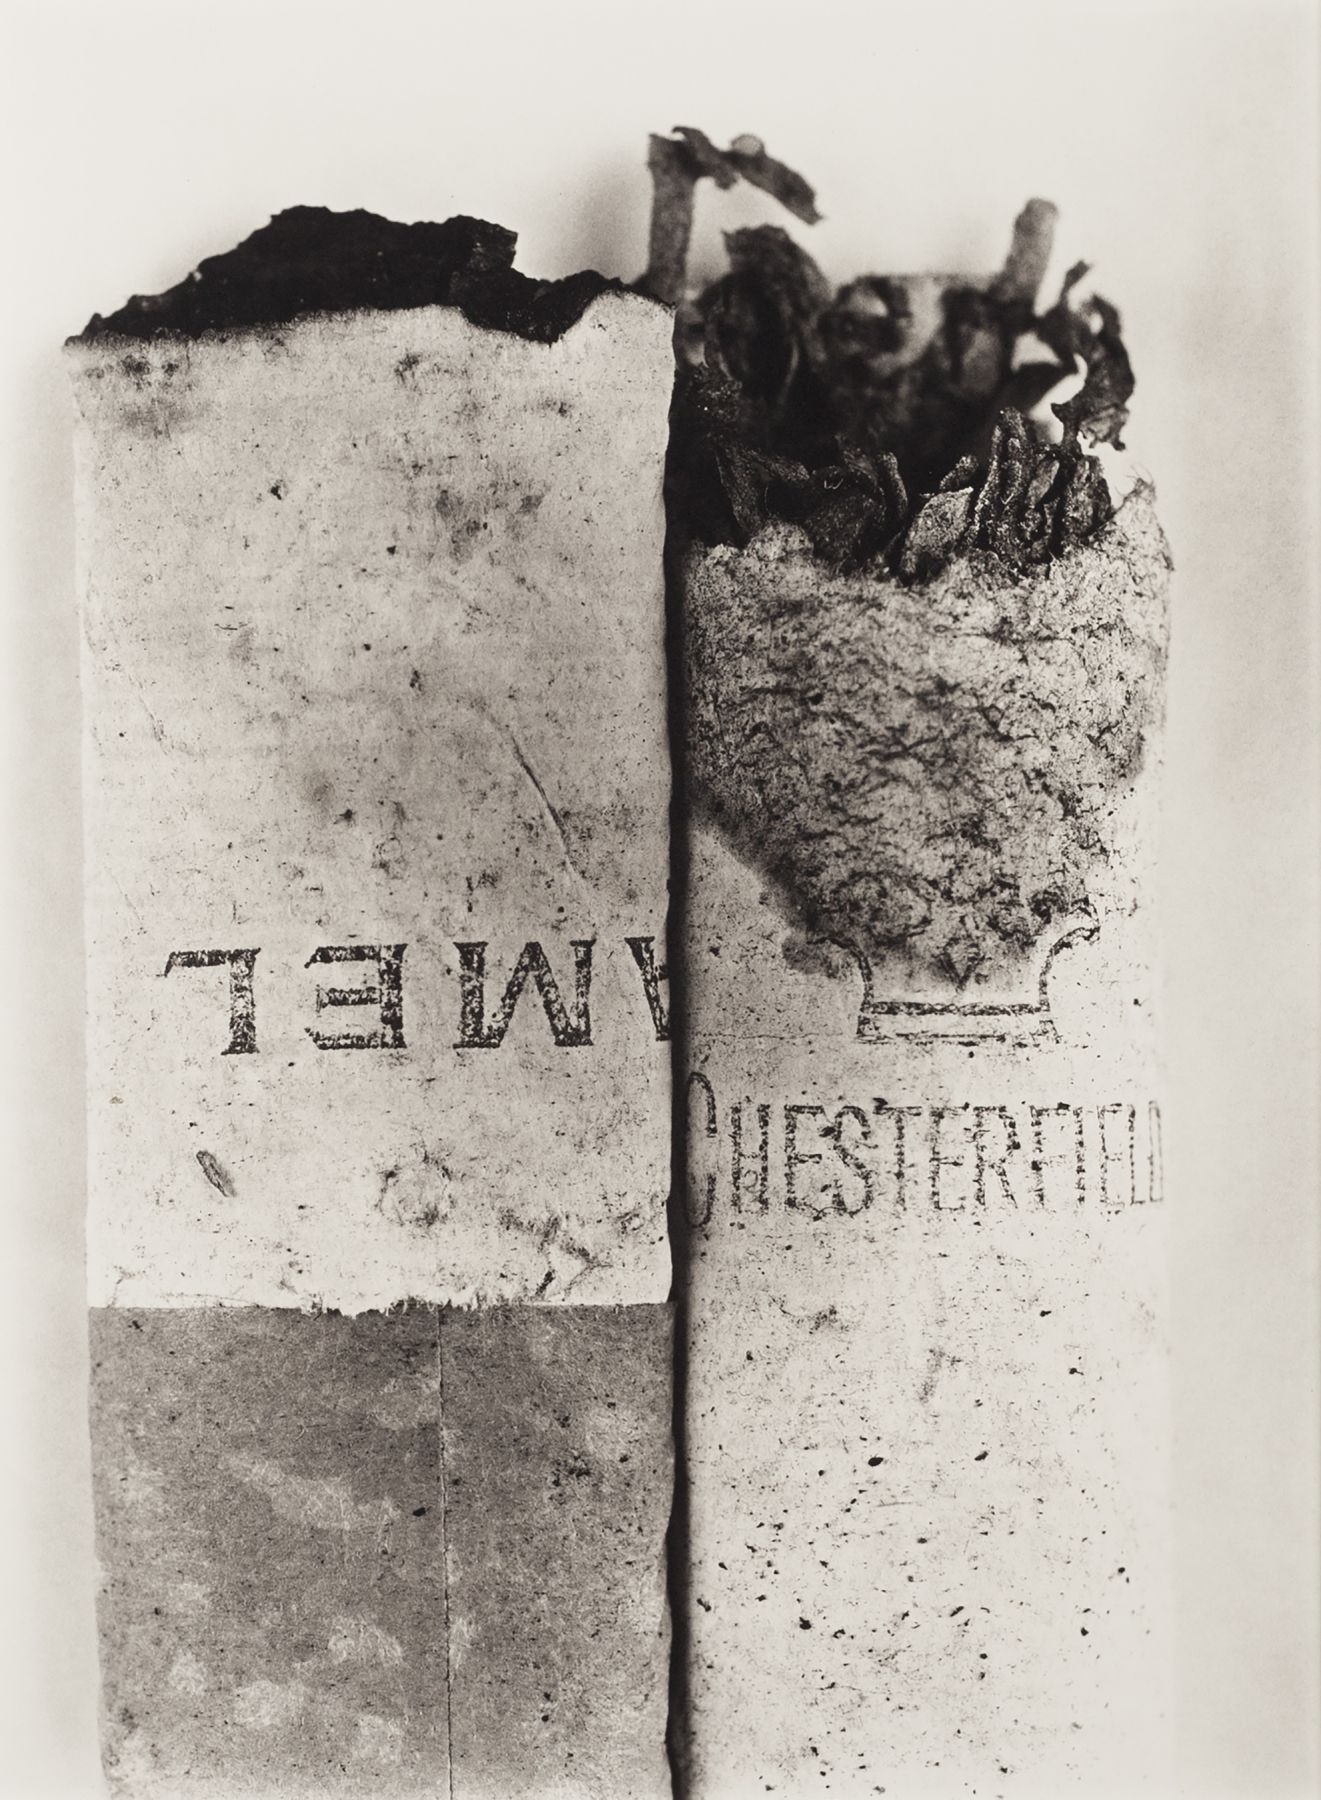 Irving Penn Cigarette No. 037, New York, 1972 / printed 1974